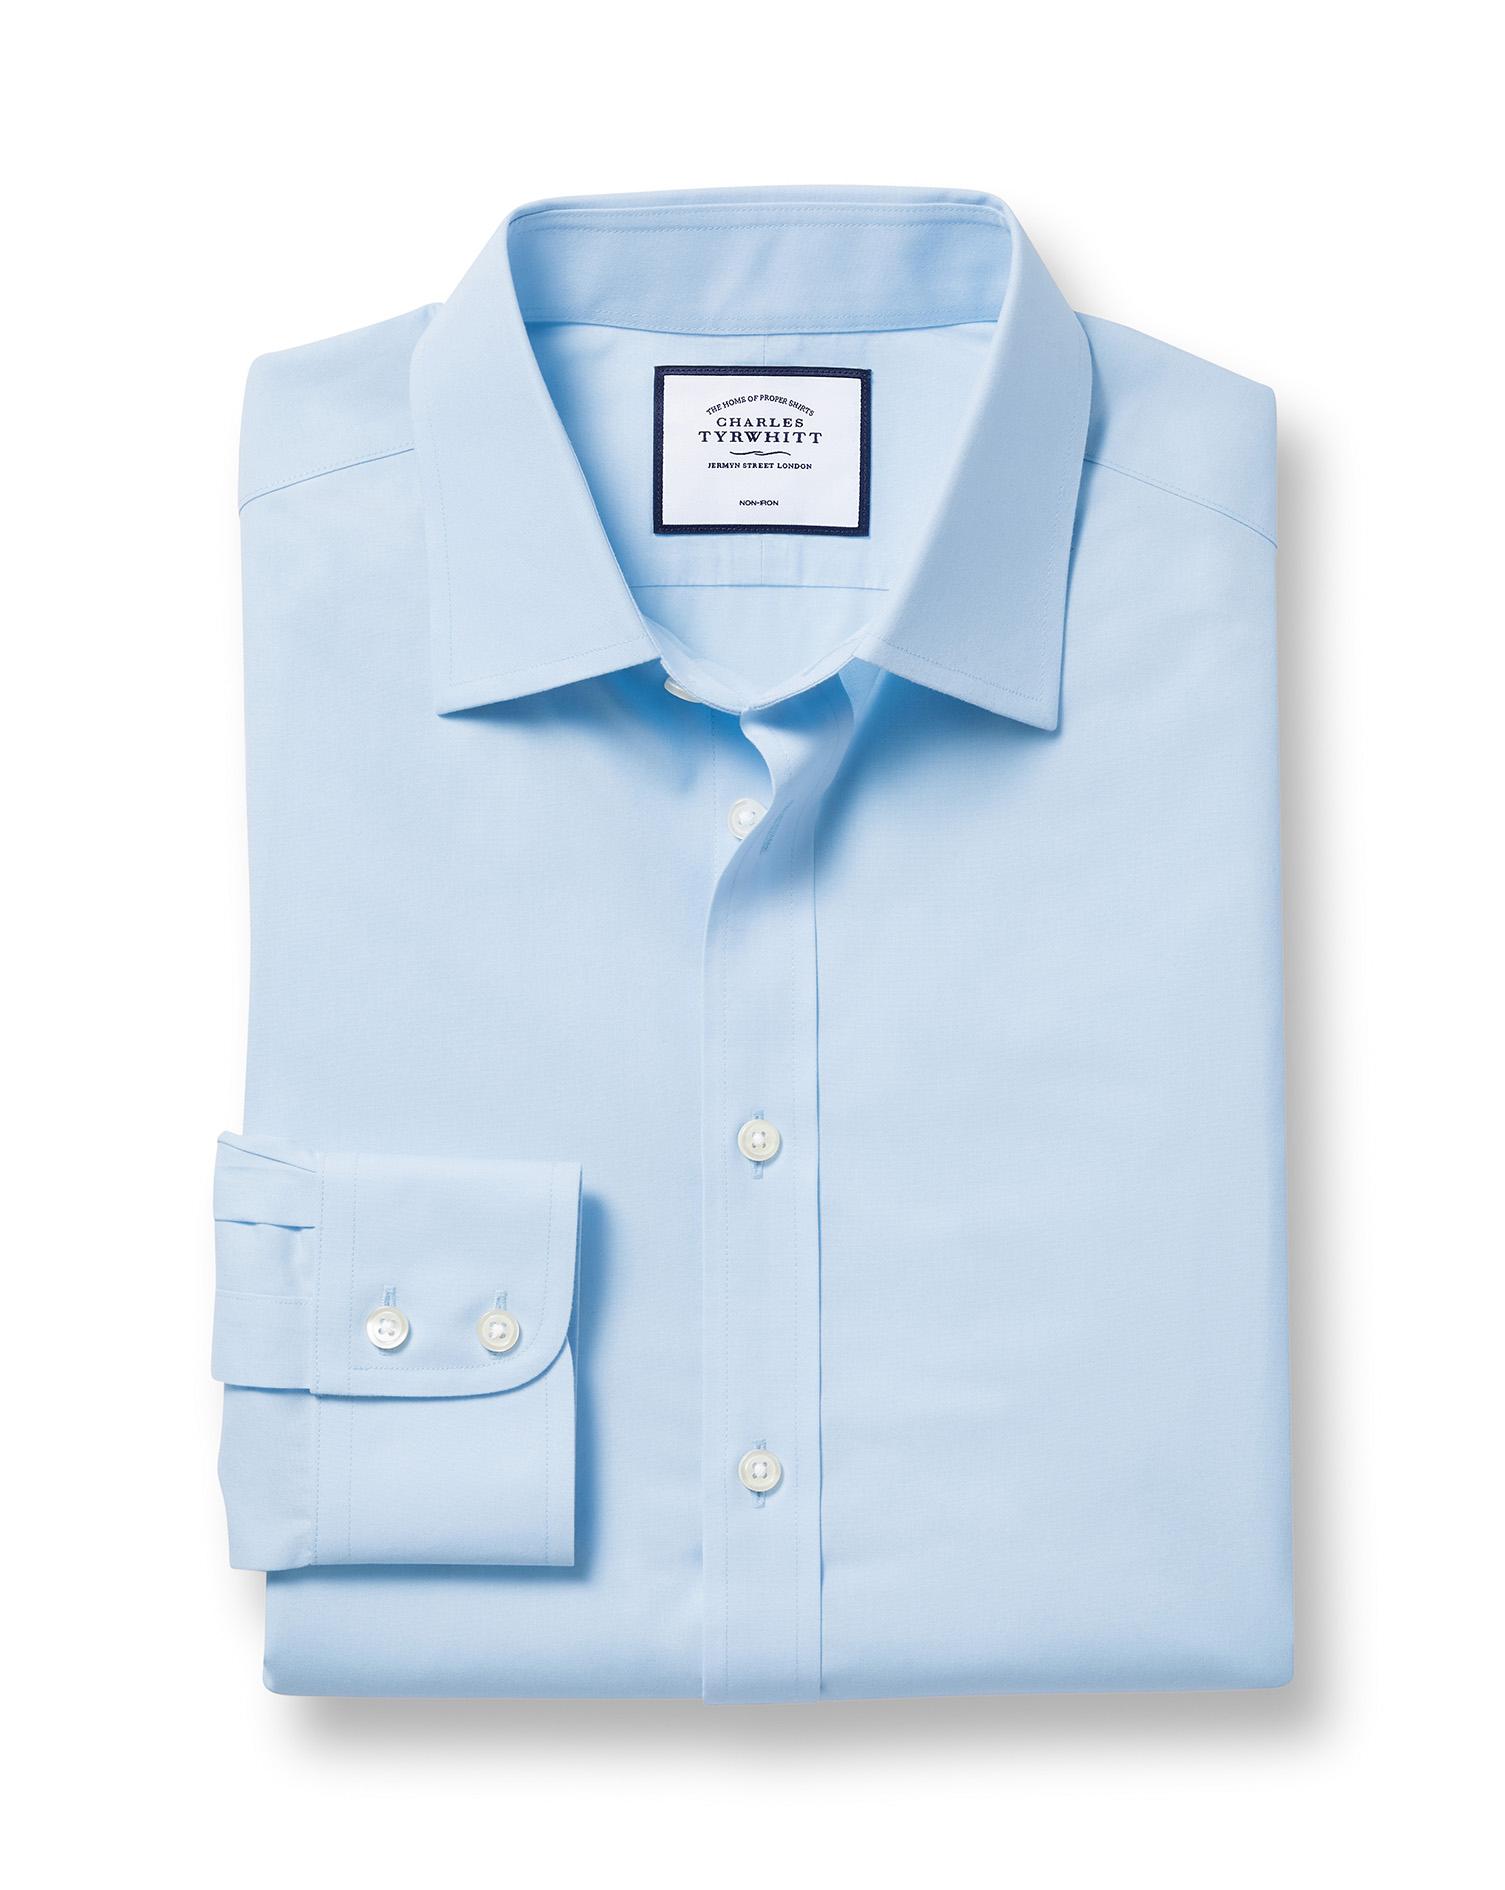 Slim Fit Non-Iron Poplin Sky Blue Cotton Formal Shirt Double Cuff Size 17/34 by Charles Tyrwhitt